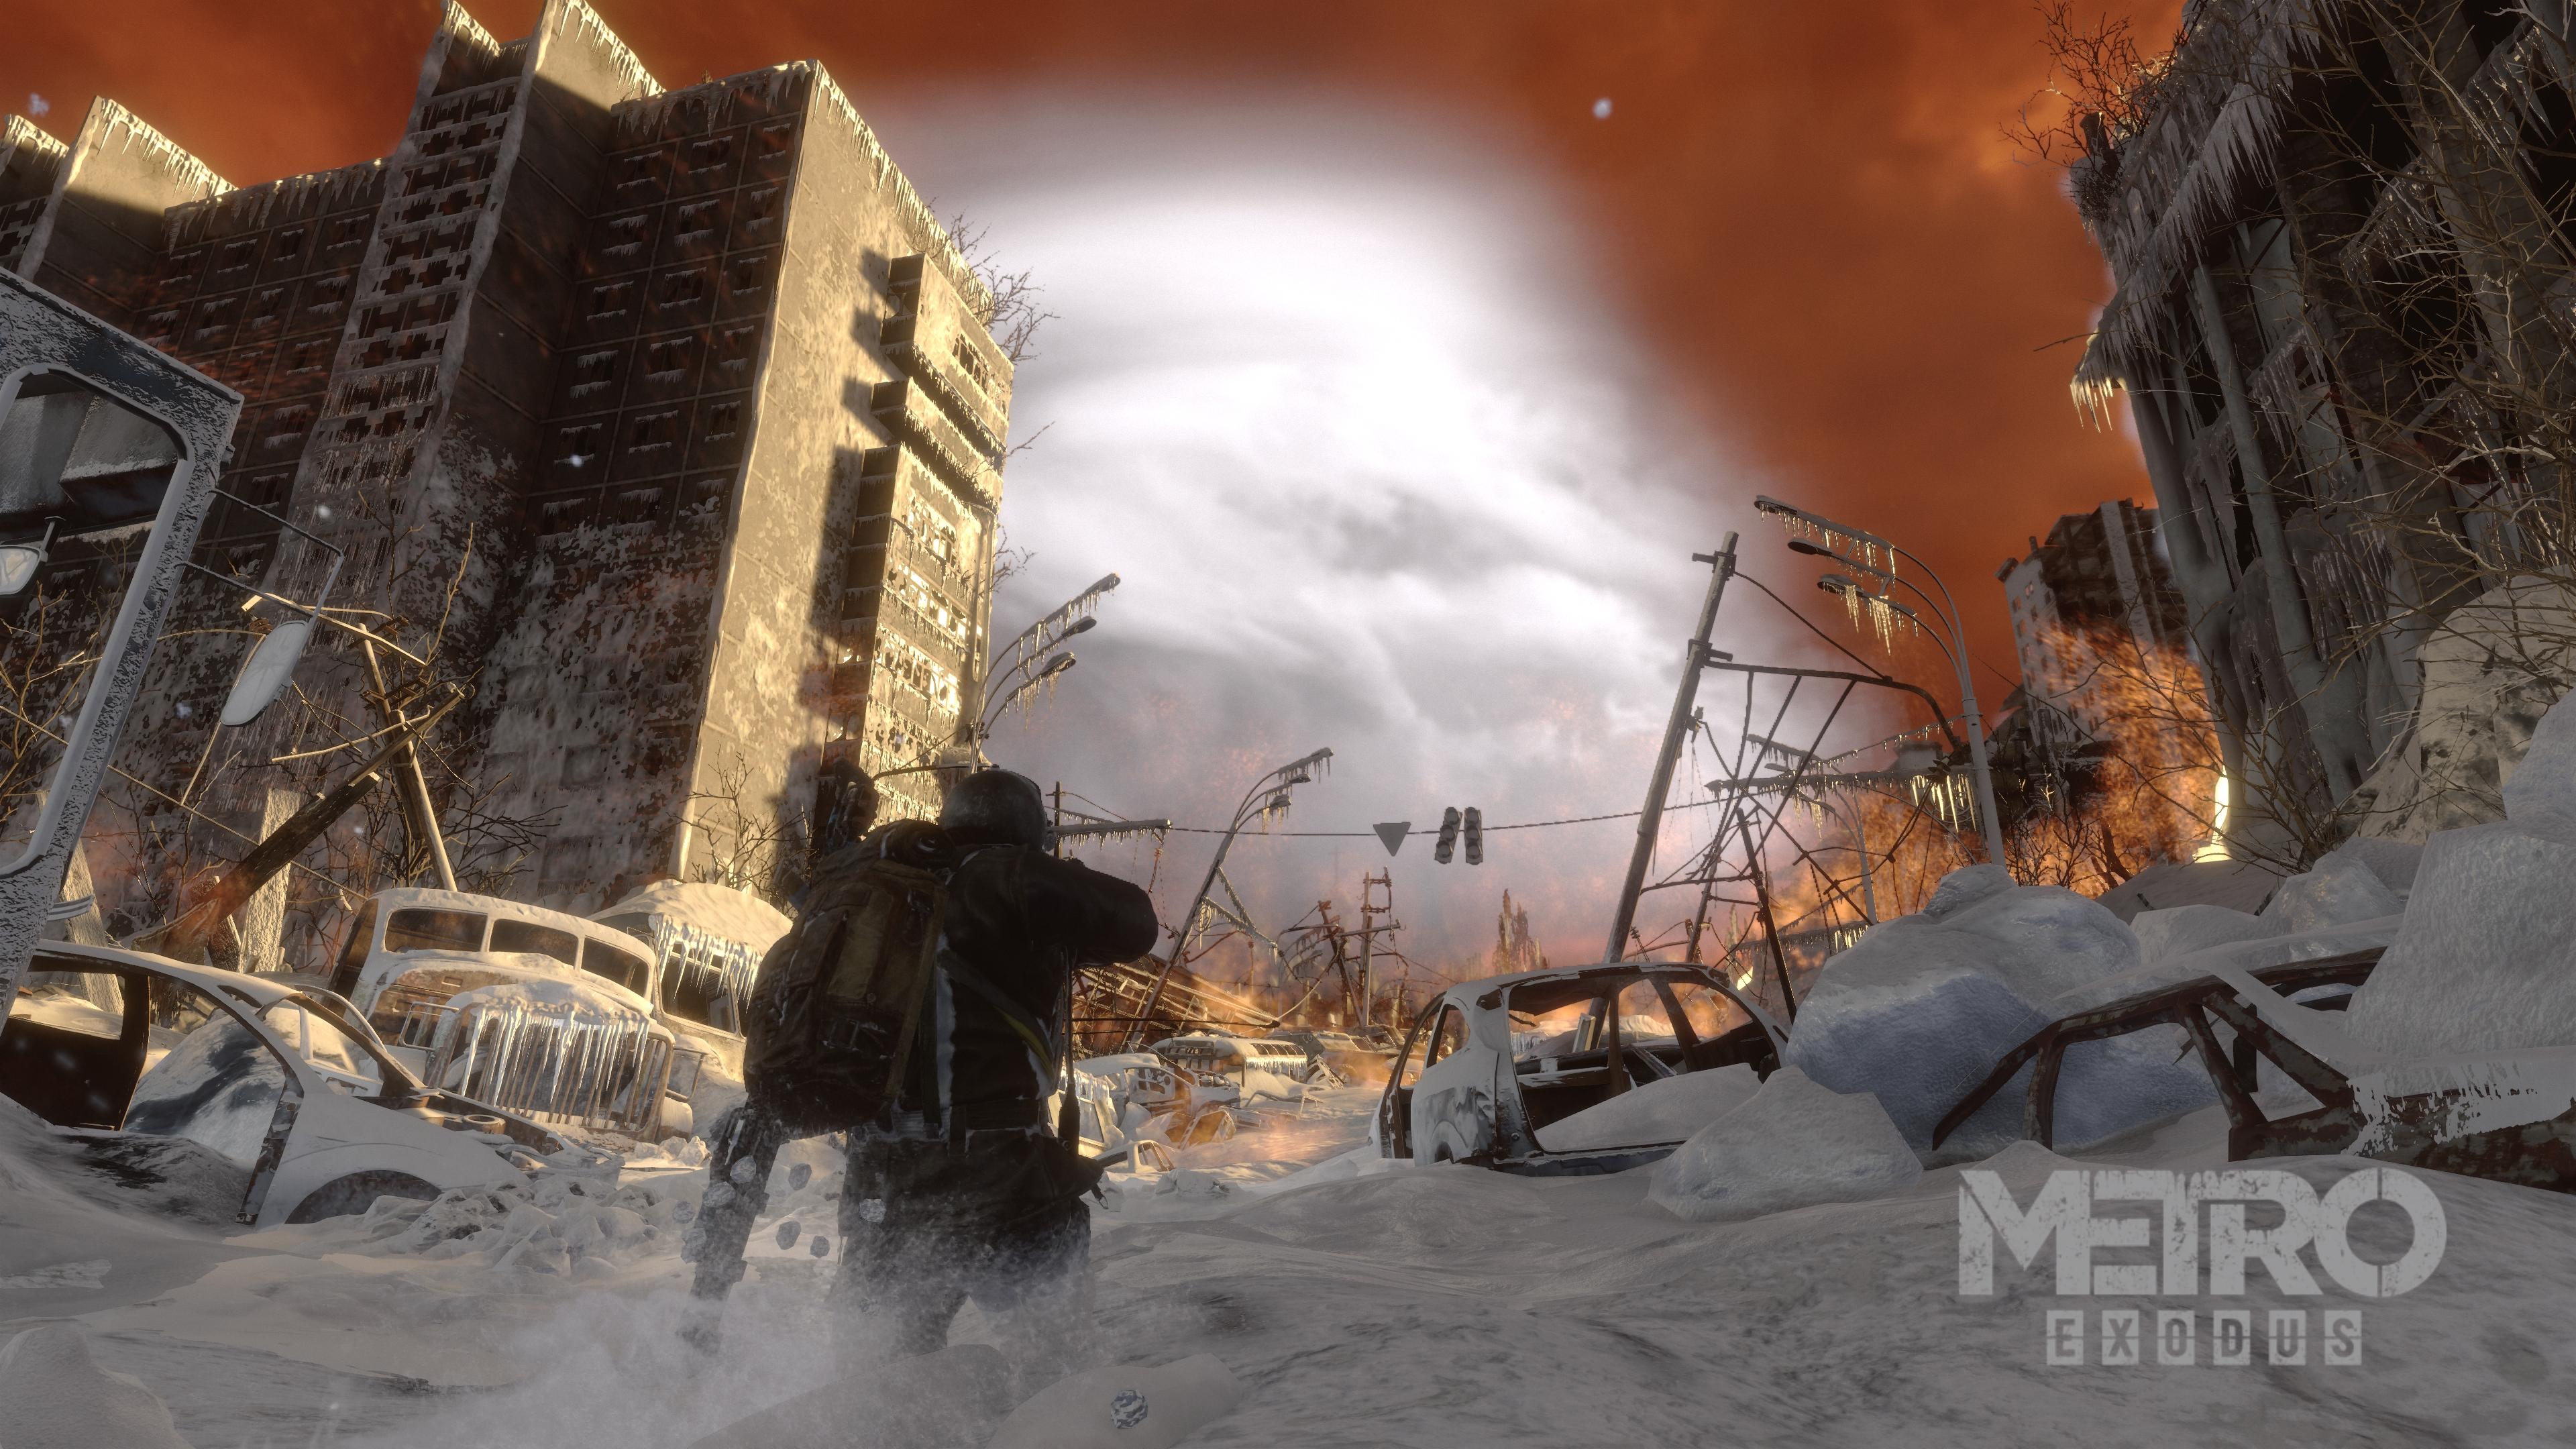 Жуткие развалины Новосибирска в игре Metro Exodus Скриншоты с Xbox One X - Metro Exodus